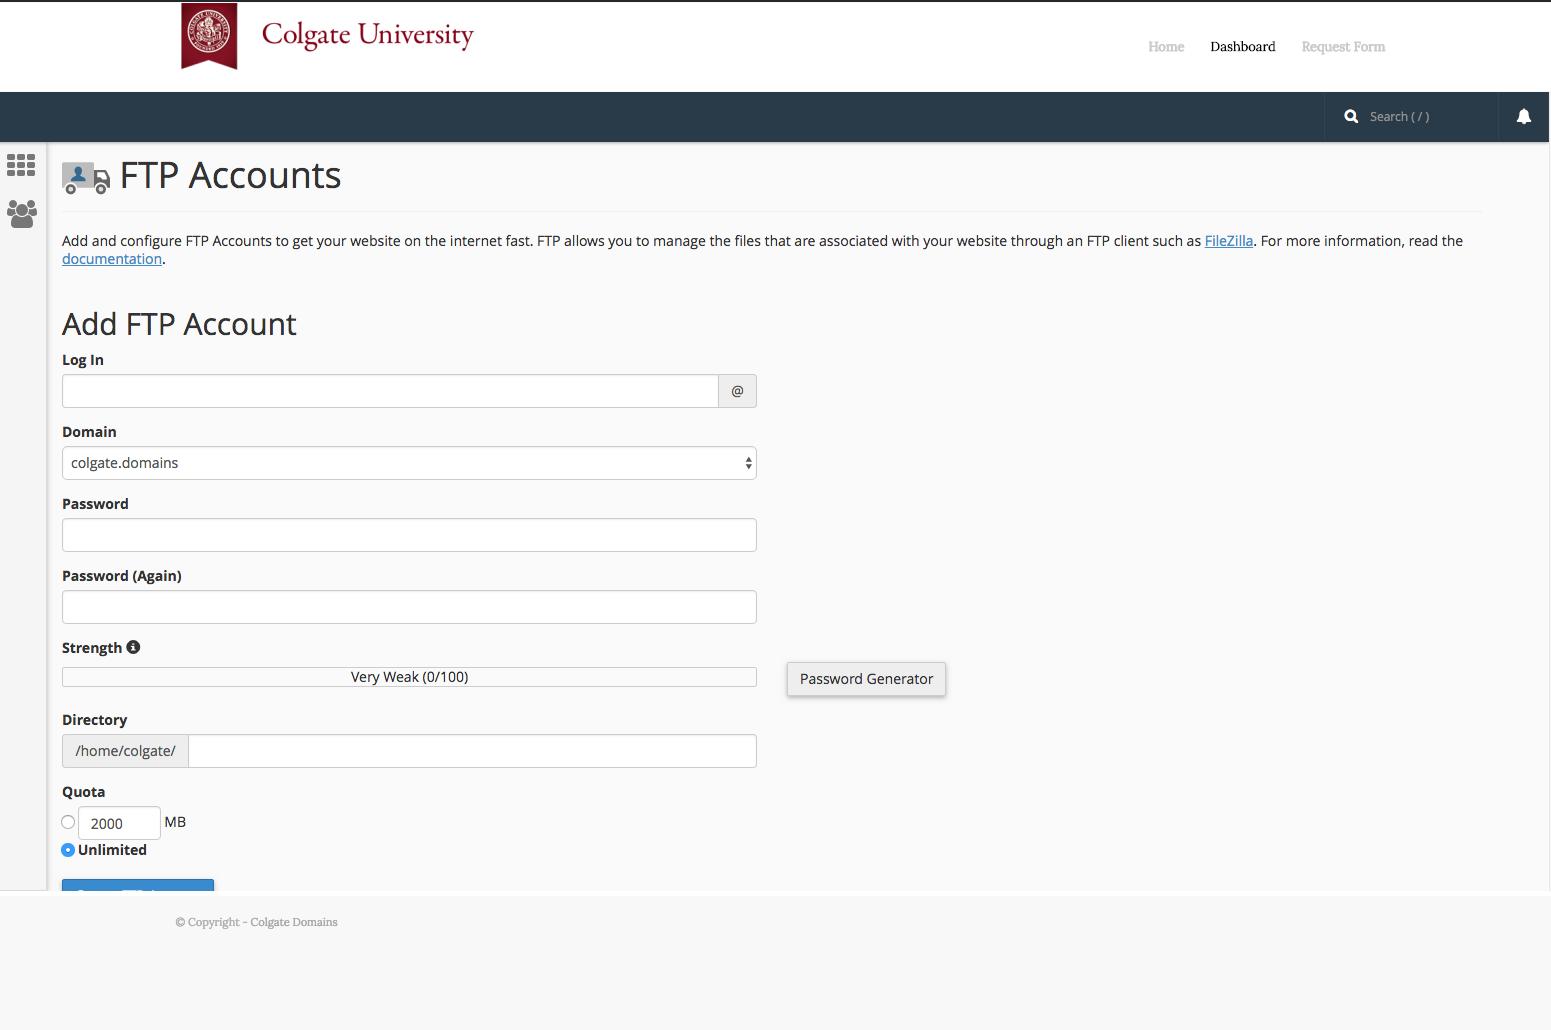 Add FTP account window